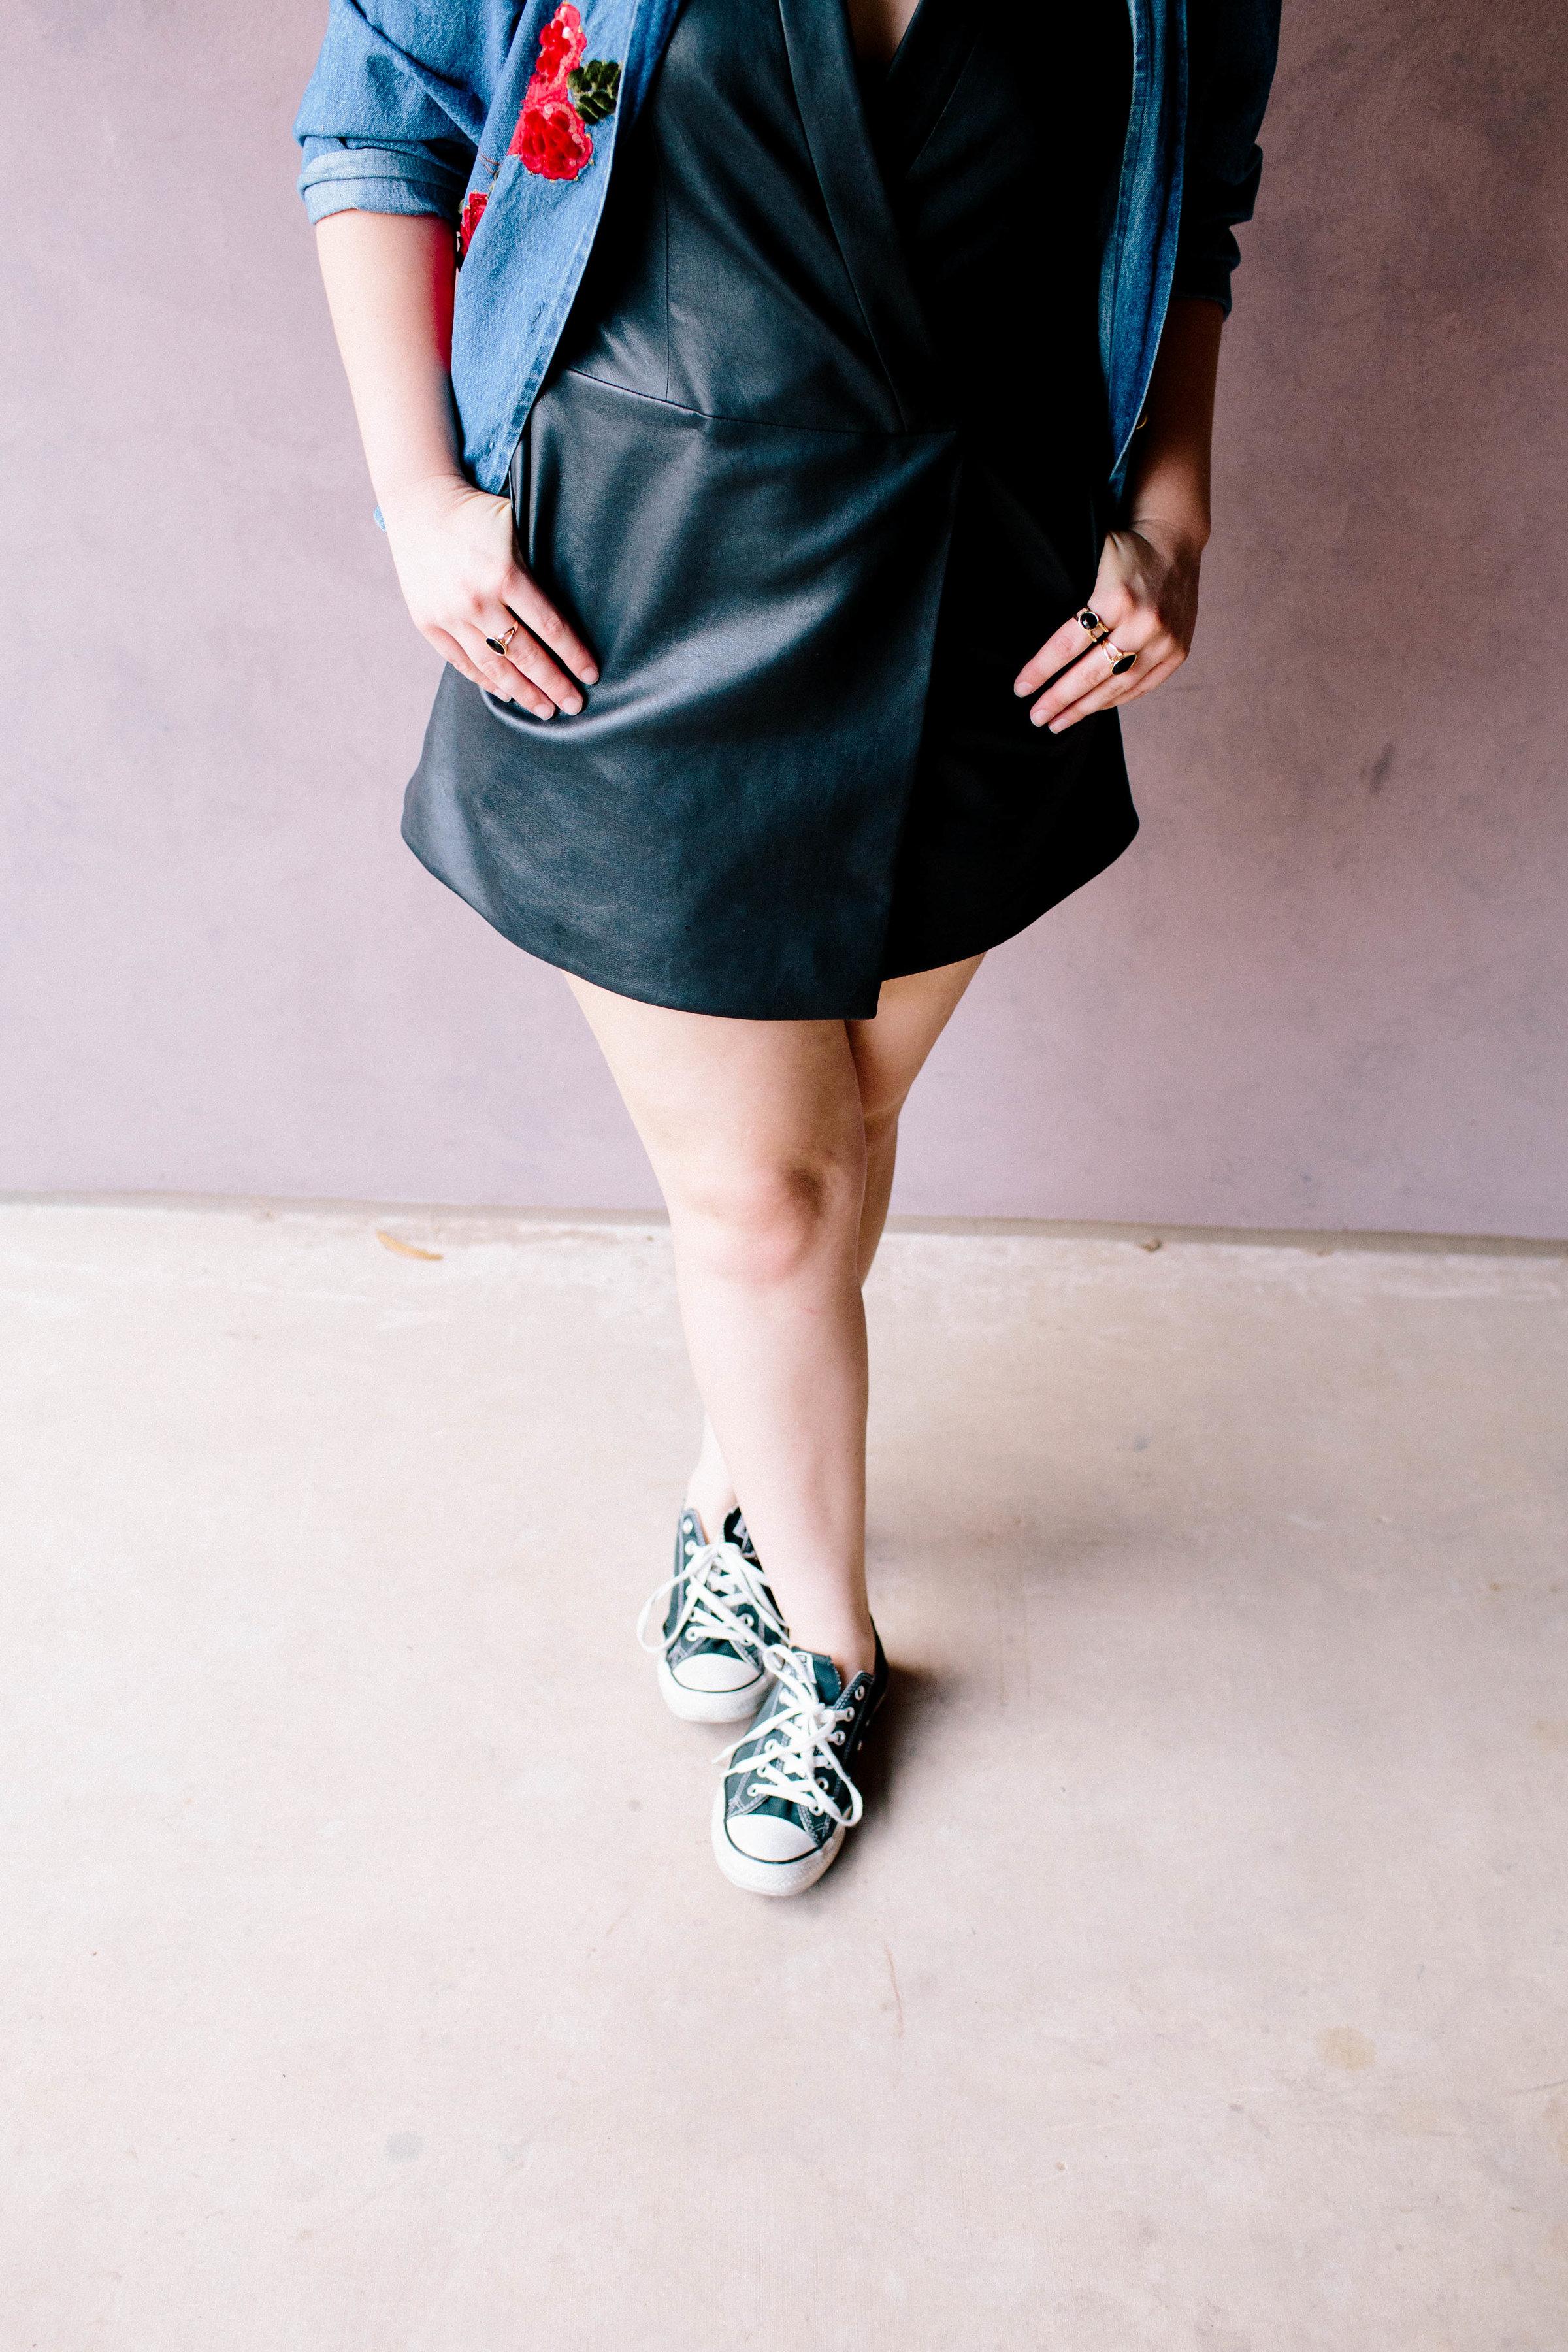 Shoes  | Jacket & Necklace: Vintage